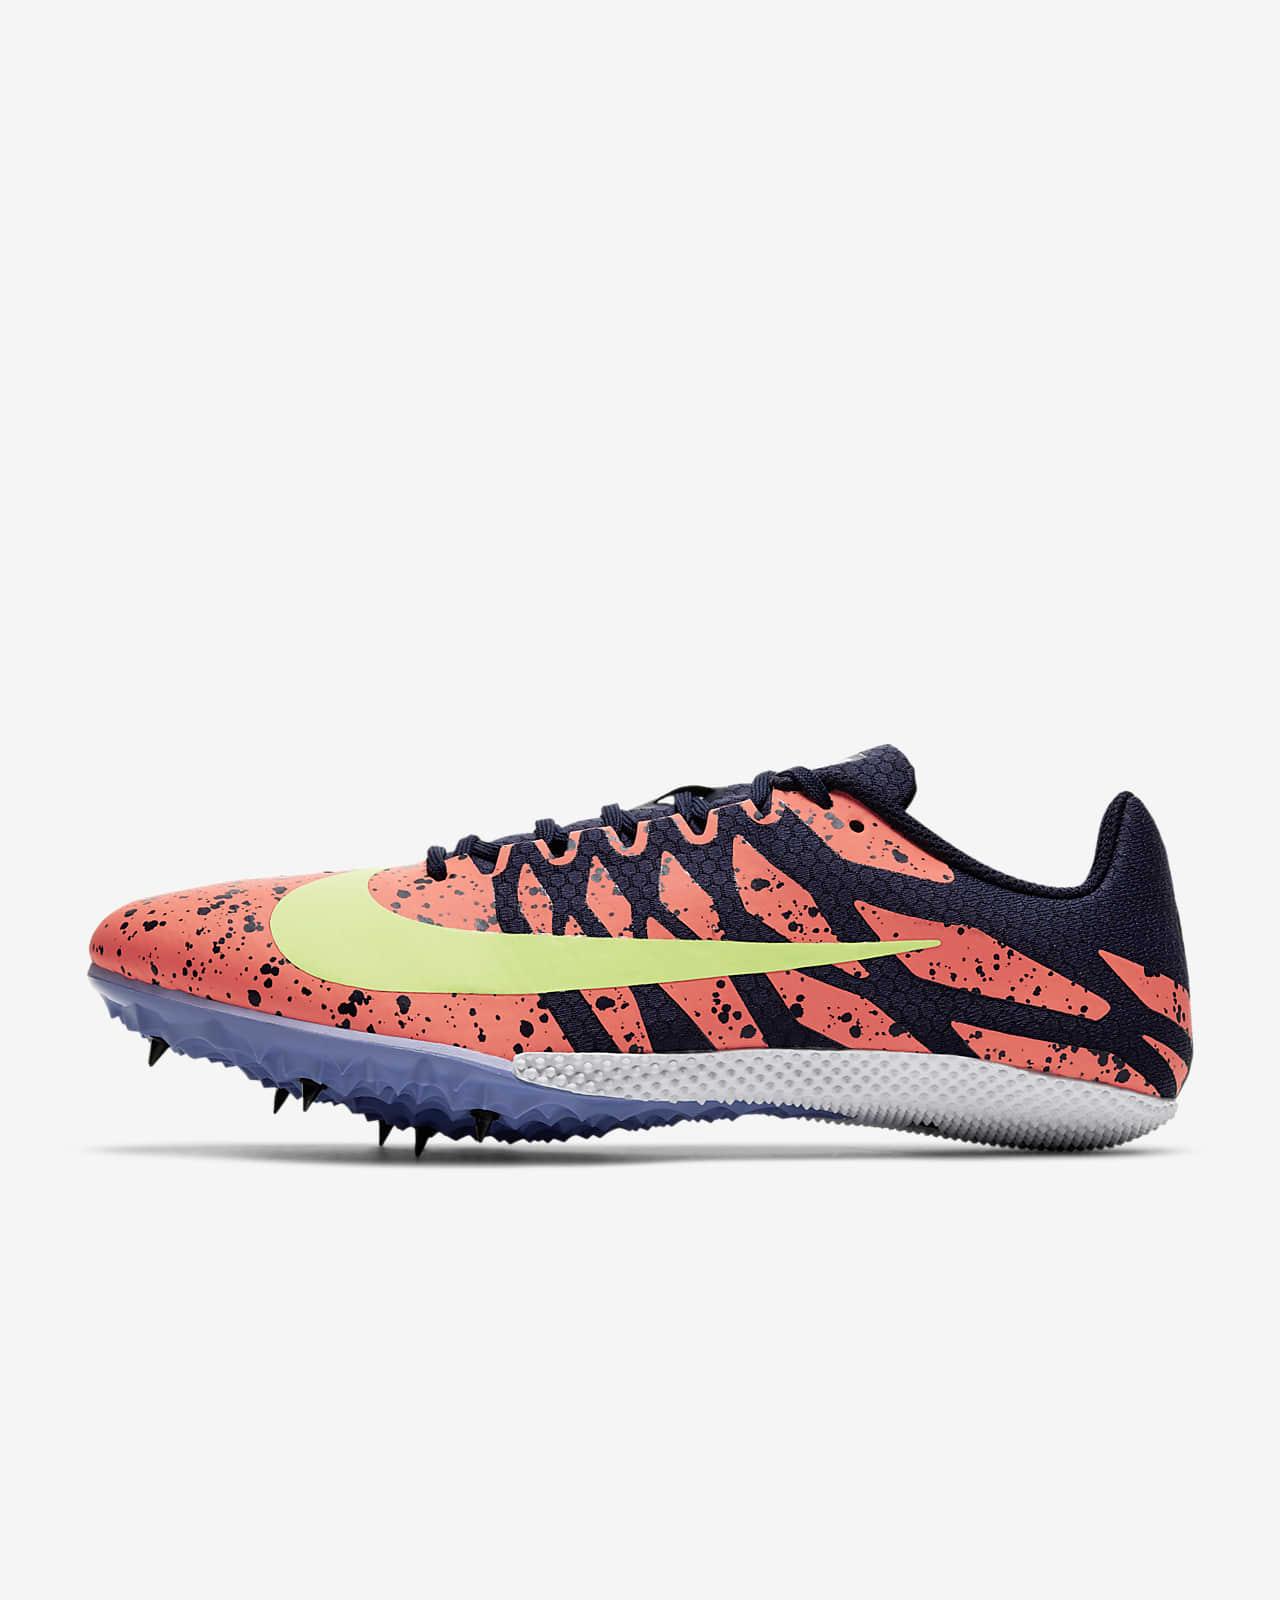 Nike Zoom Rival S 9 Racing Spike